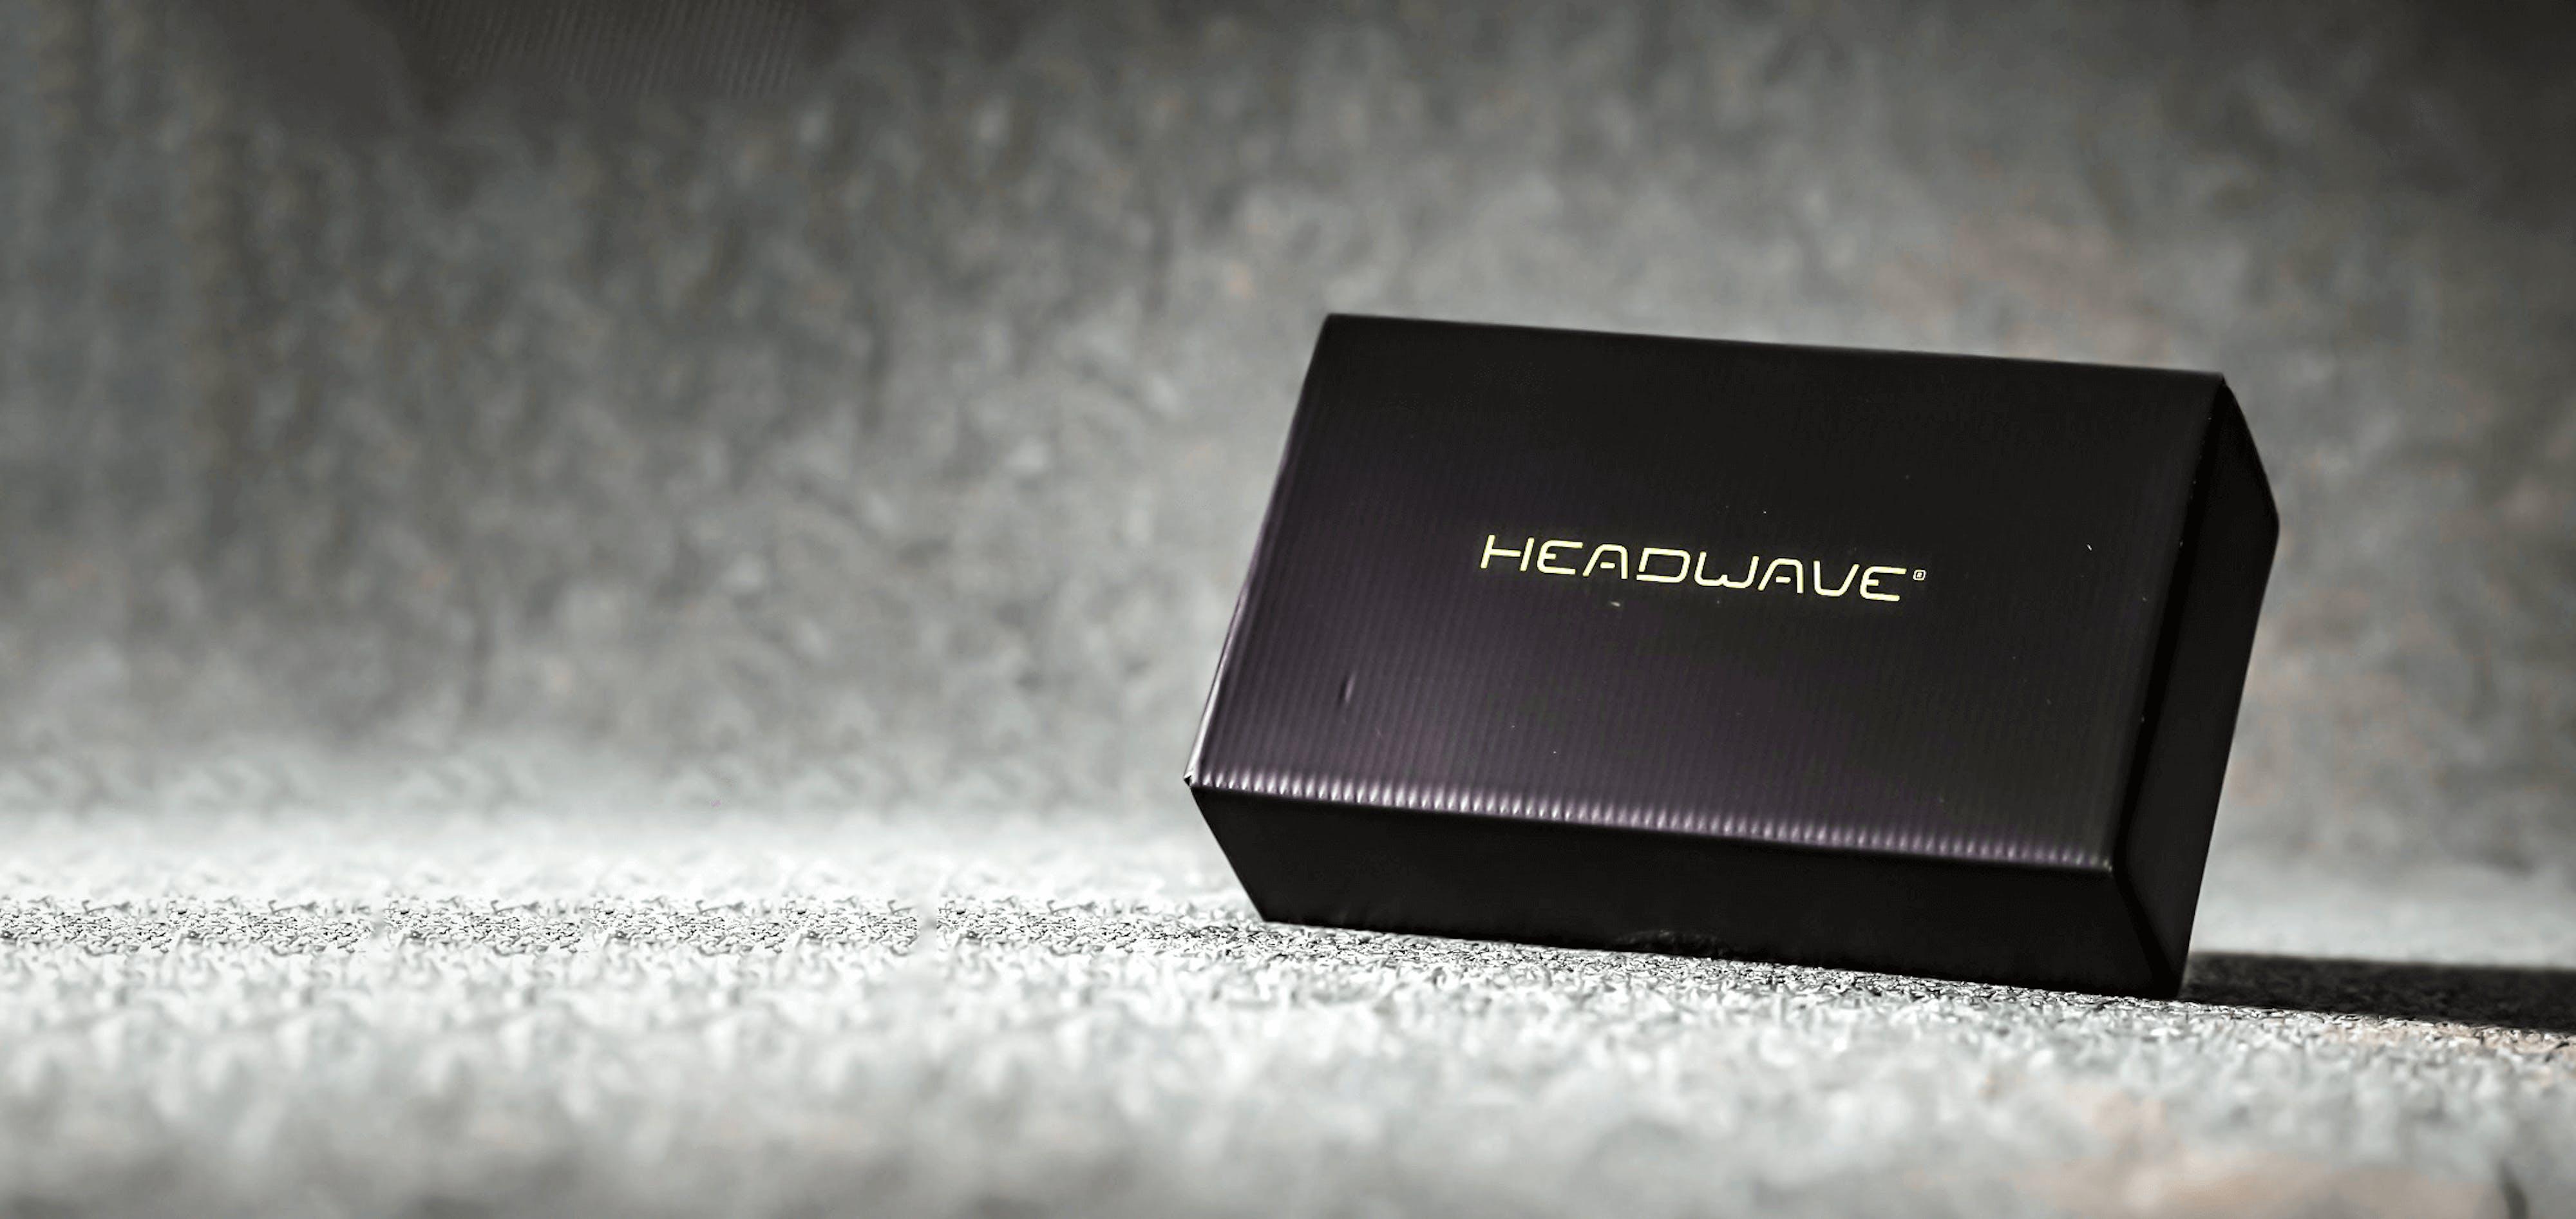 HEADWAVEのプロダクトについて